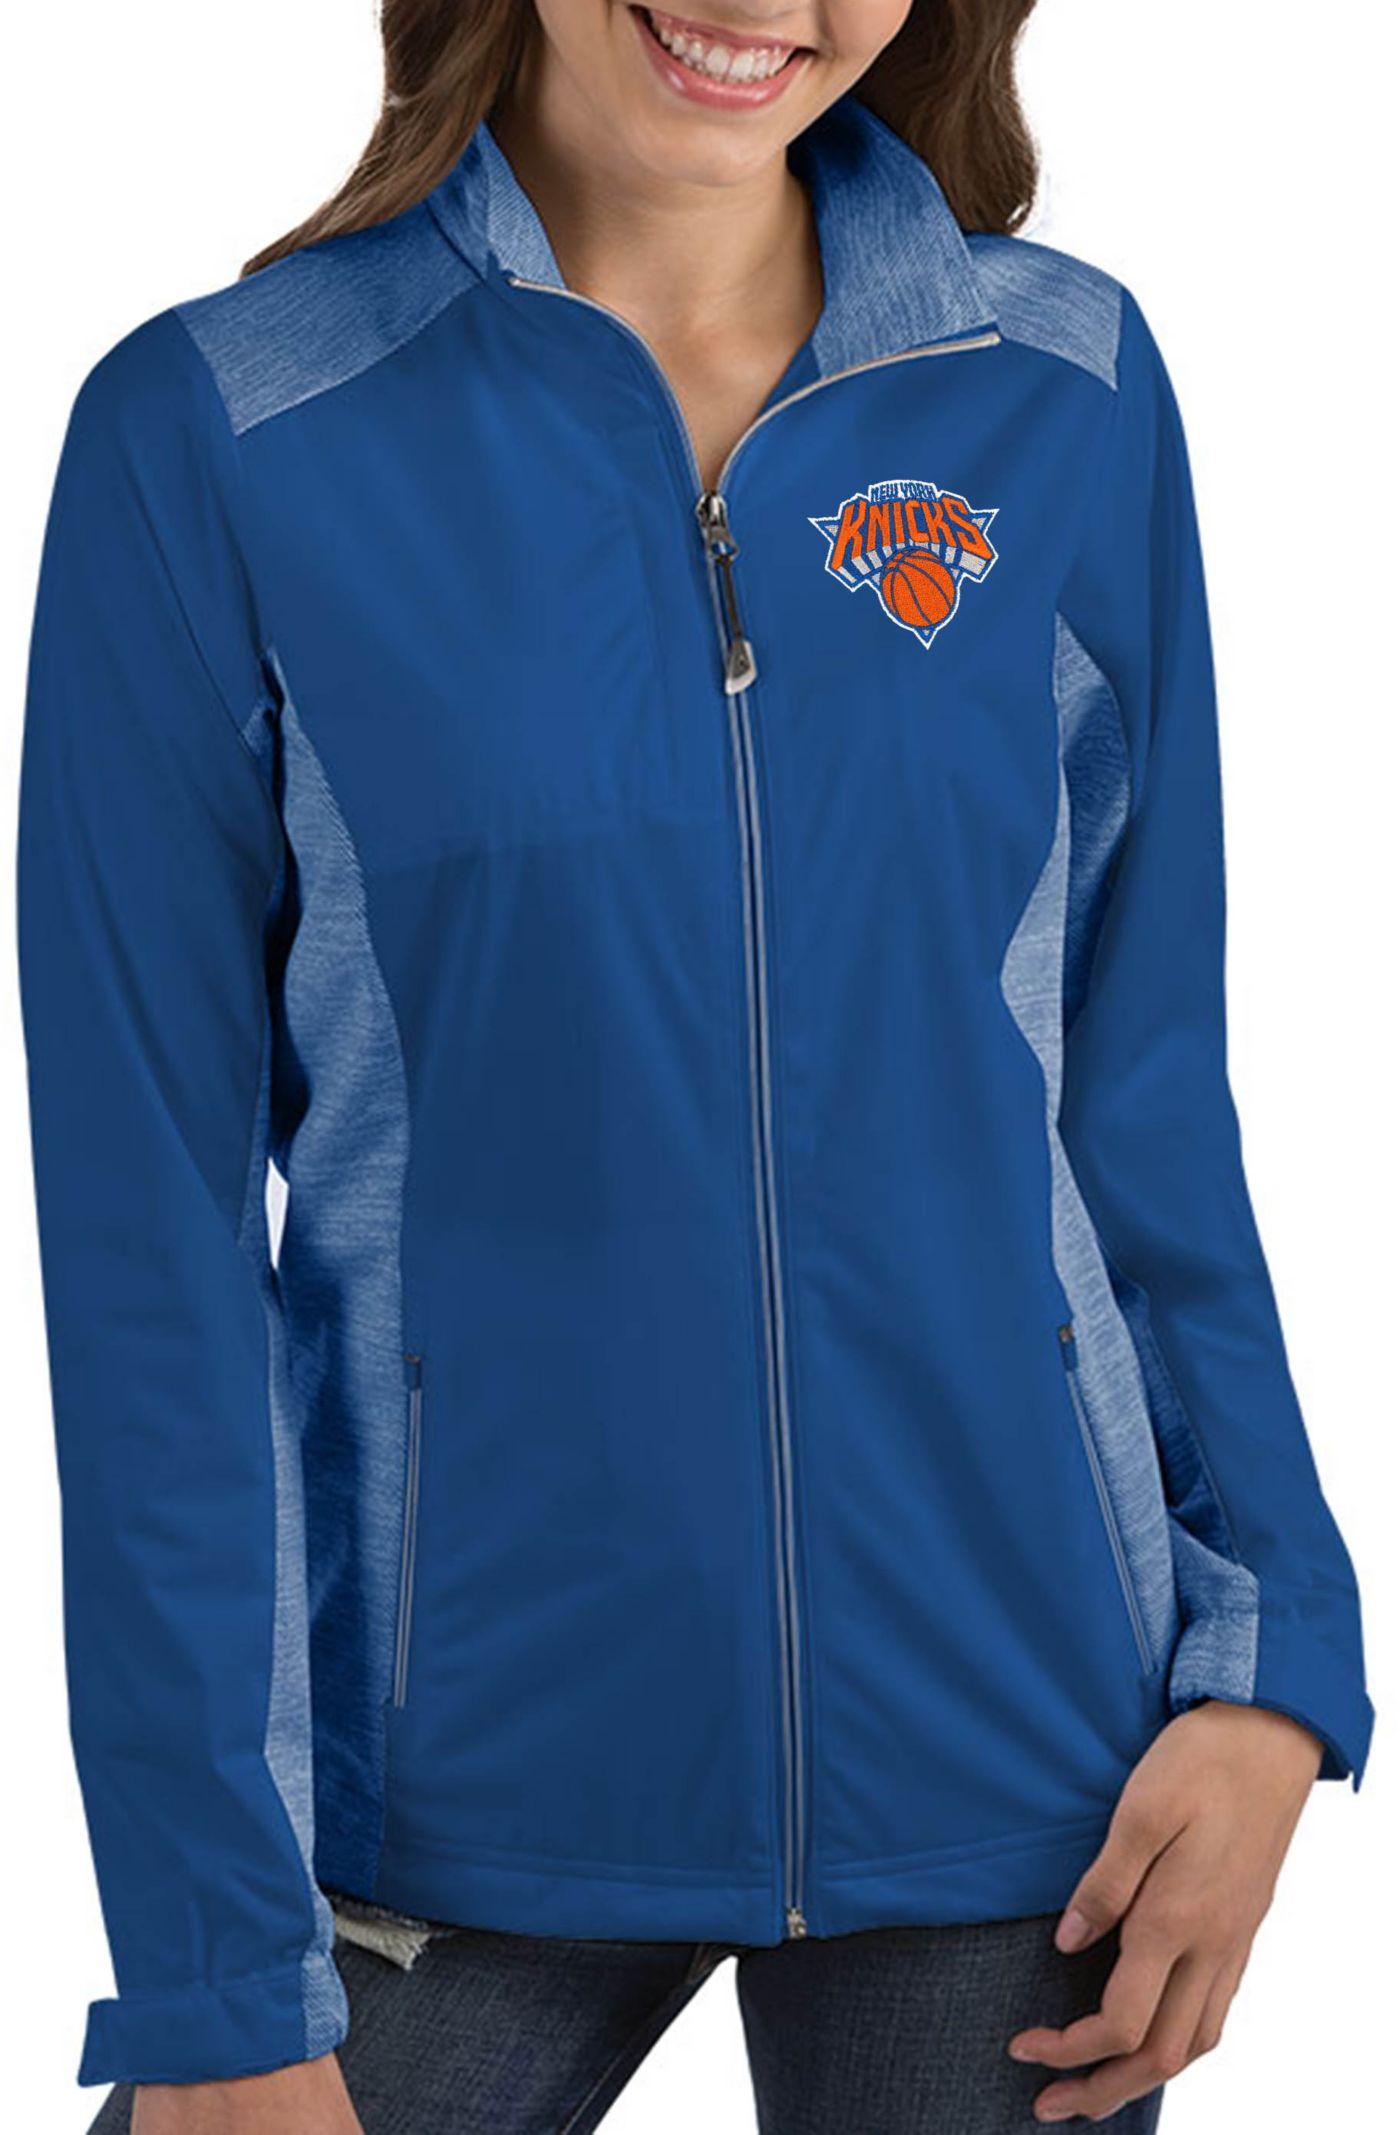 Antigua Women's New York Knicks Revolve Full-Zip Jacket